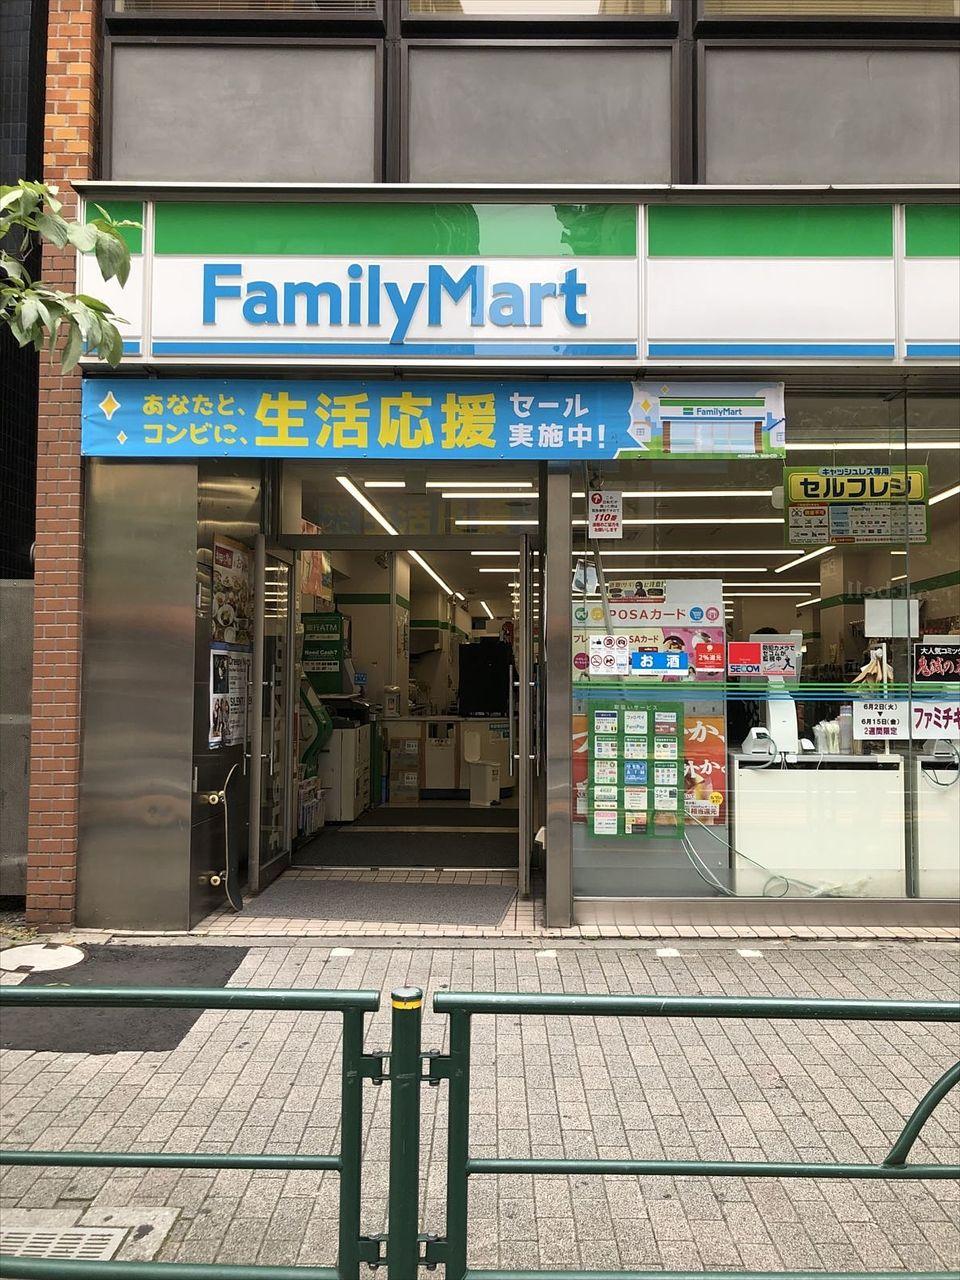 GSハイム佐藤ビルから徒歩1分のファミリーマート新宿駅南店